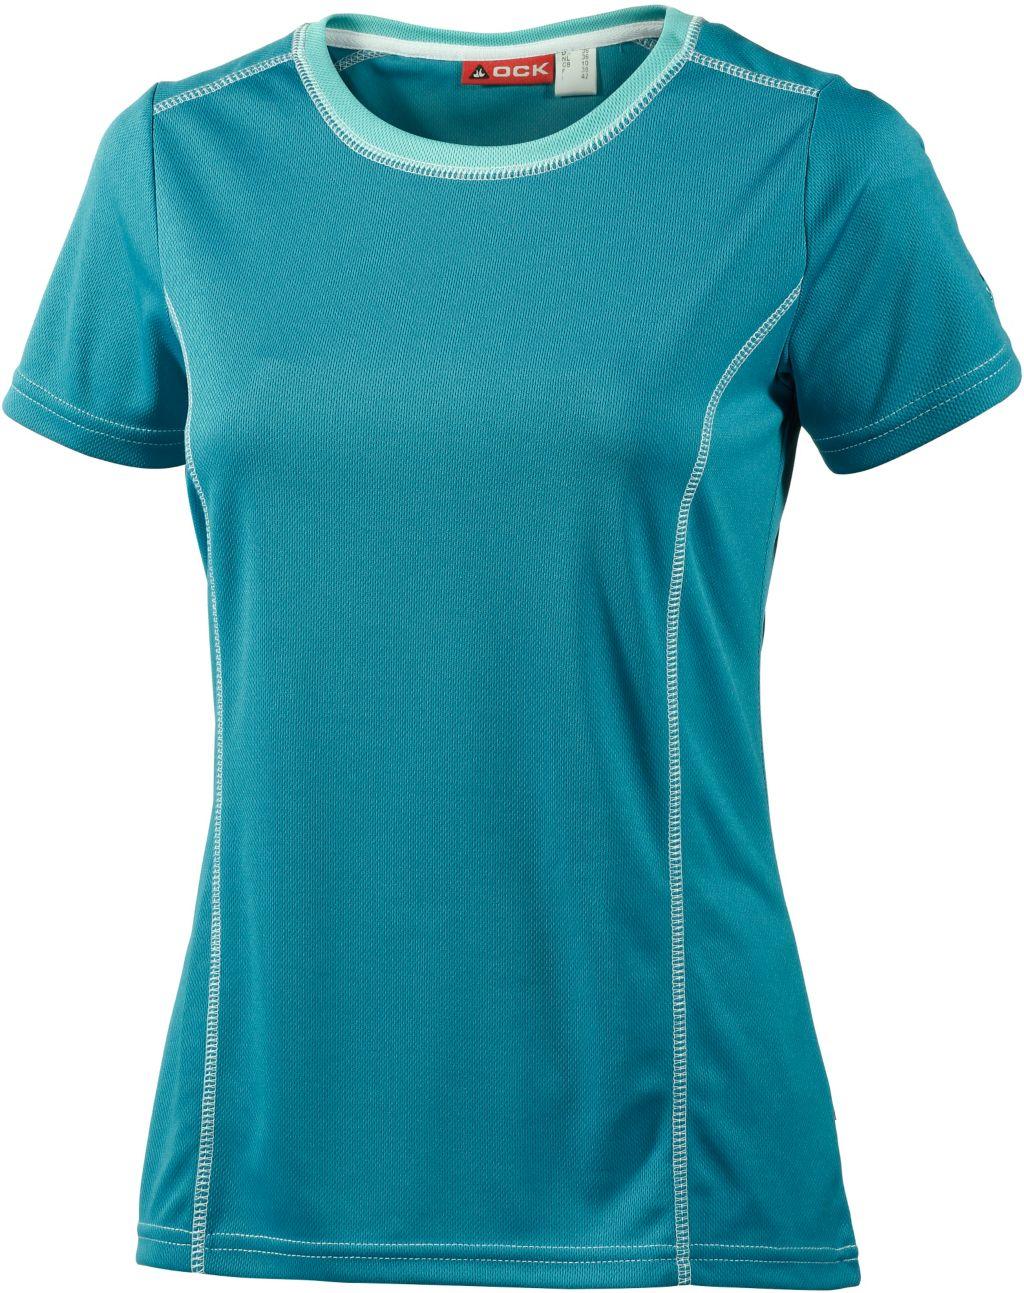 Shirt aus leichter Mesh-Qualität